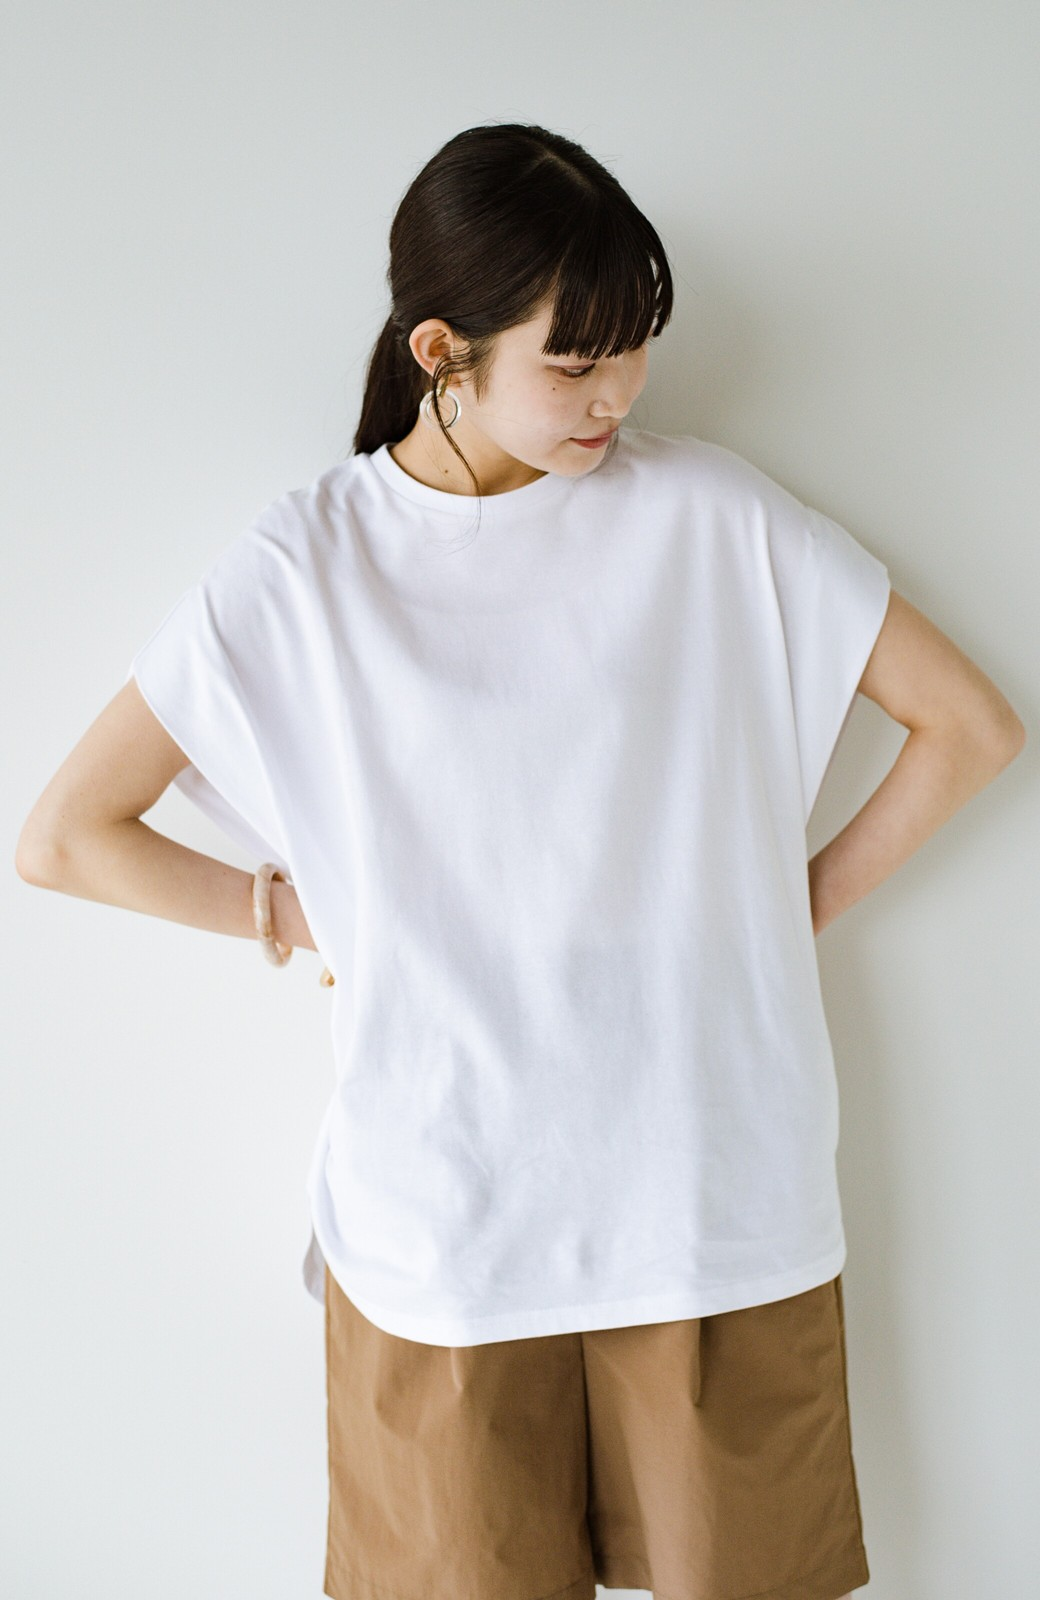 haco! PBPオーガニックコットン 楽ちんなのにブラウス気分で着られる大人のおめかしTシャツ <ホワイト>の商品写真4